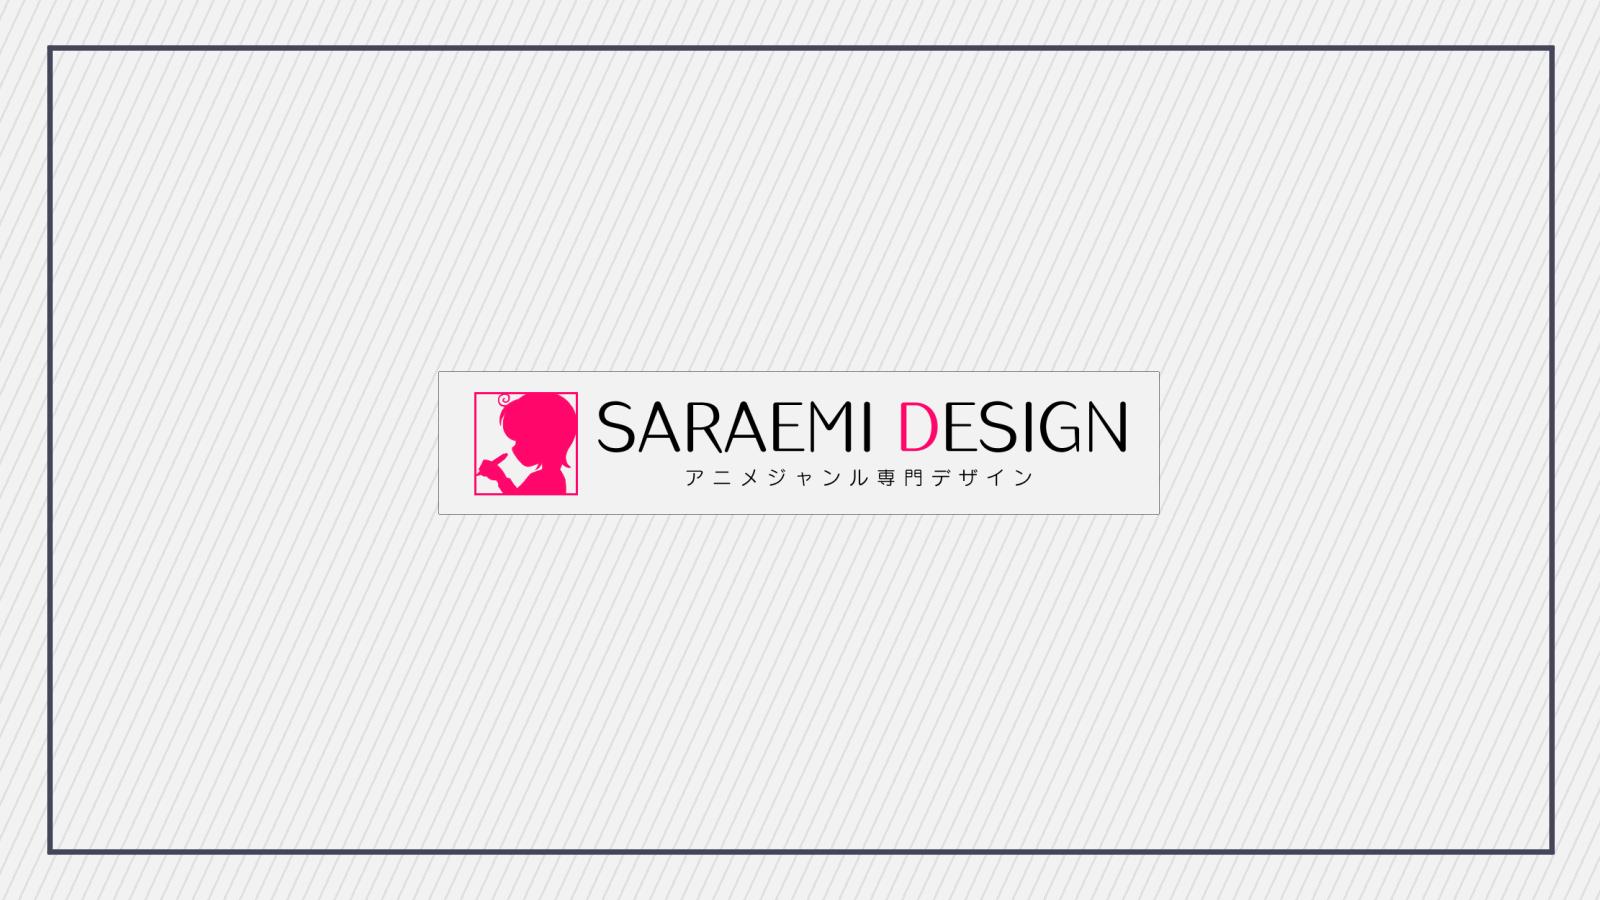 SARAEMI DESIGN   アニメジャンル専門デザイン